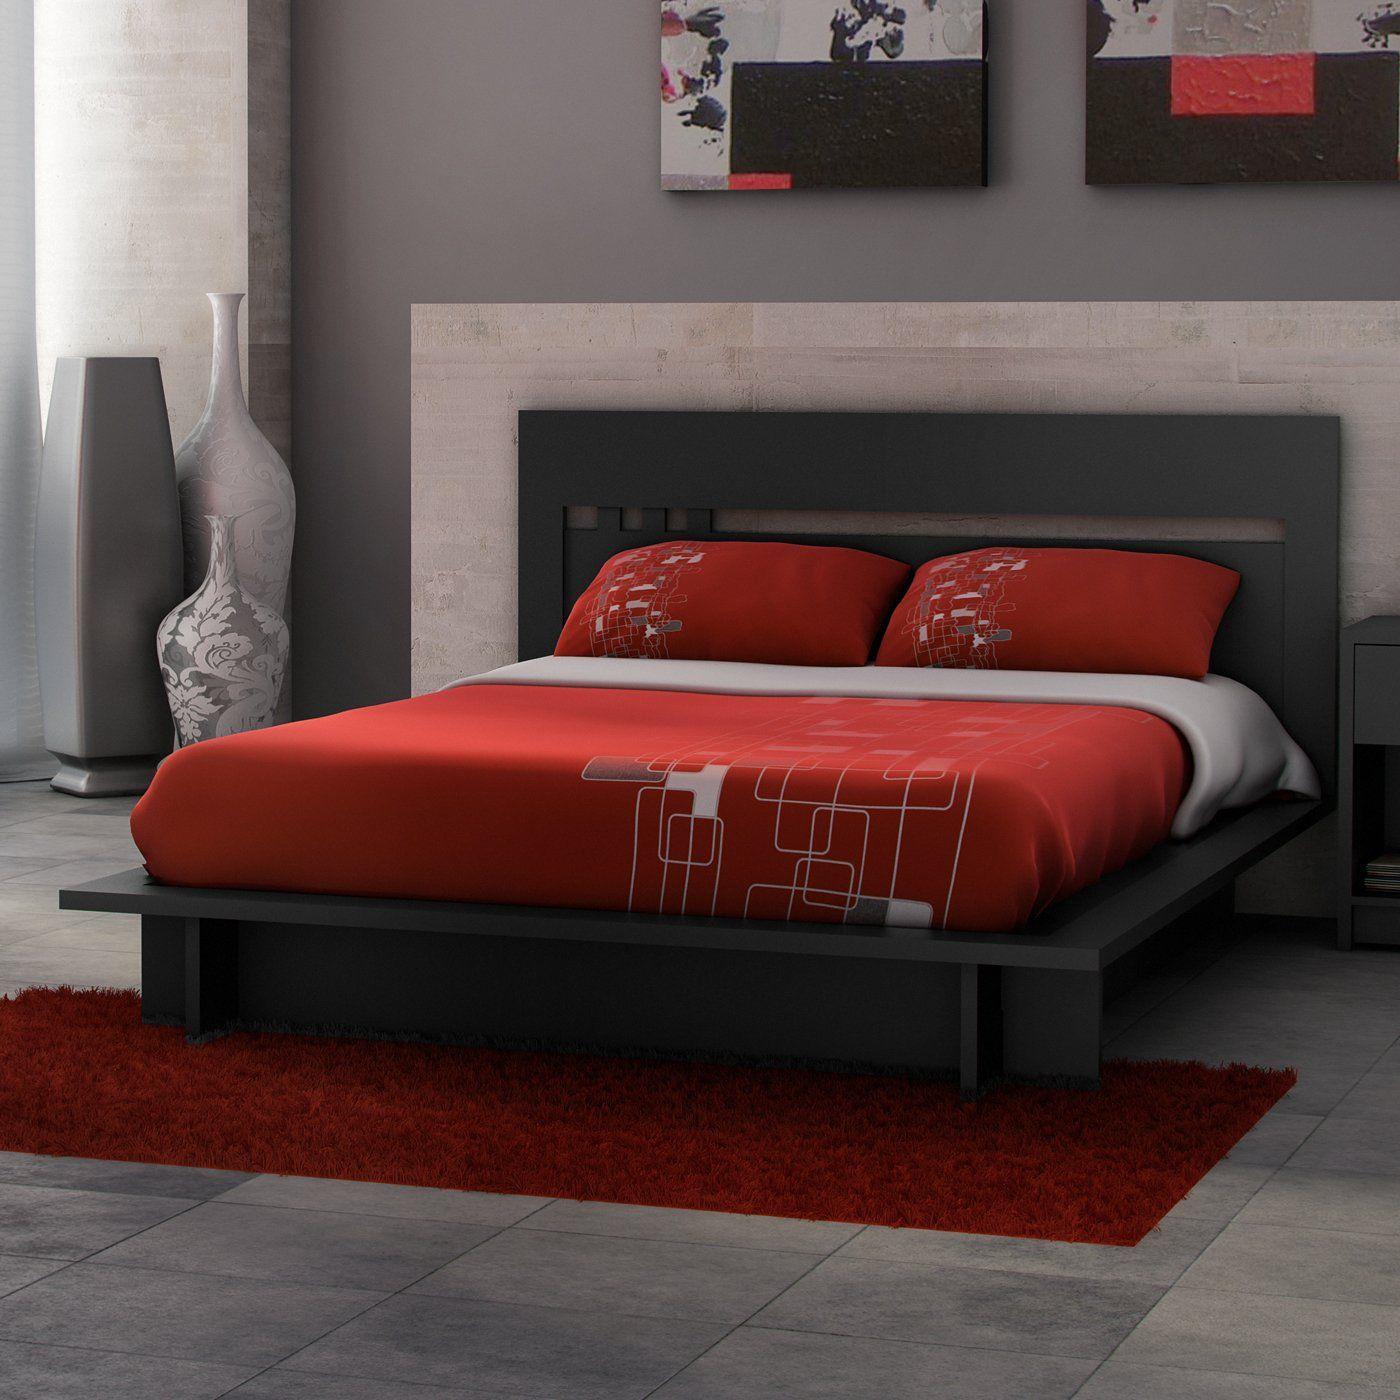 Stellar Home S2002 Milan Platform Bed, Solid Black Home